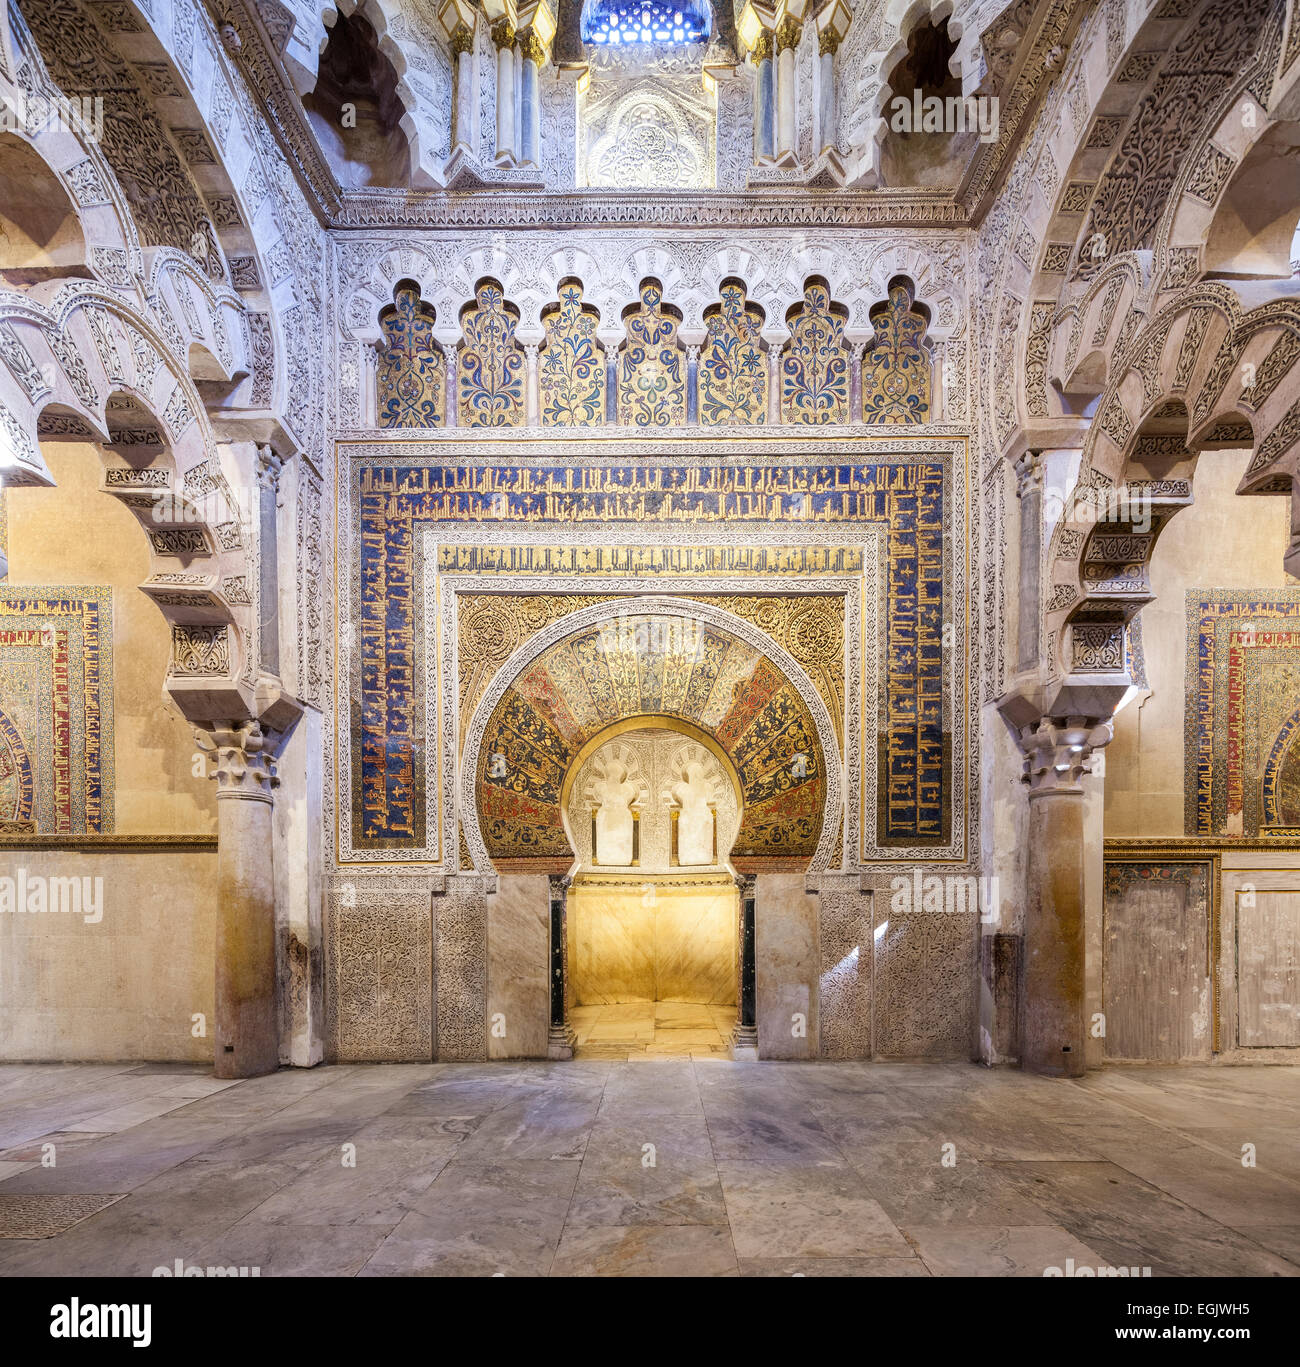 Córdoba España Gran Mezquita interior. Mihrab de la Mezquita de Córdoba. Imagen De Stock